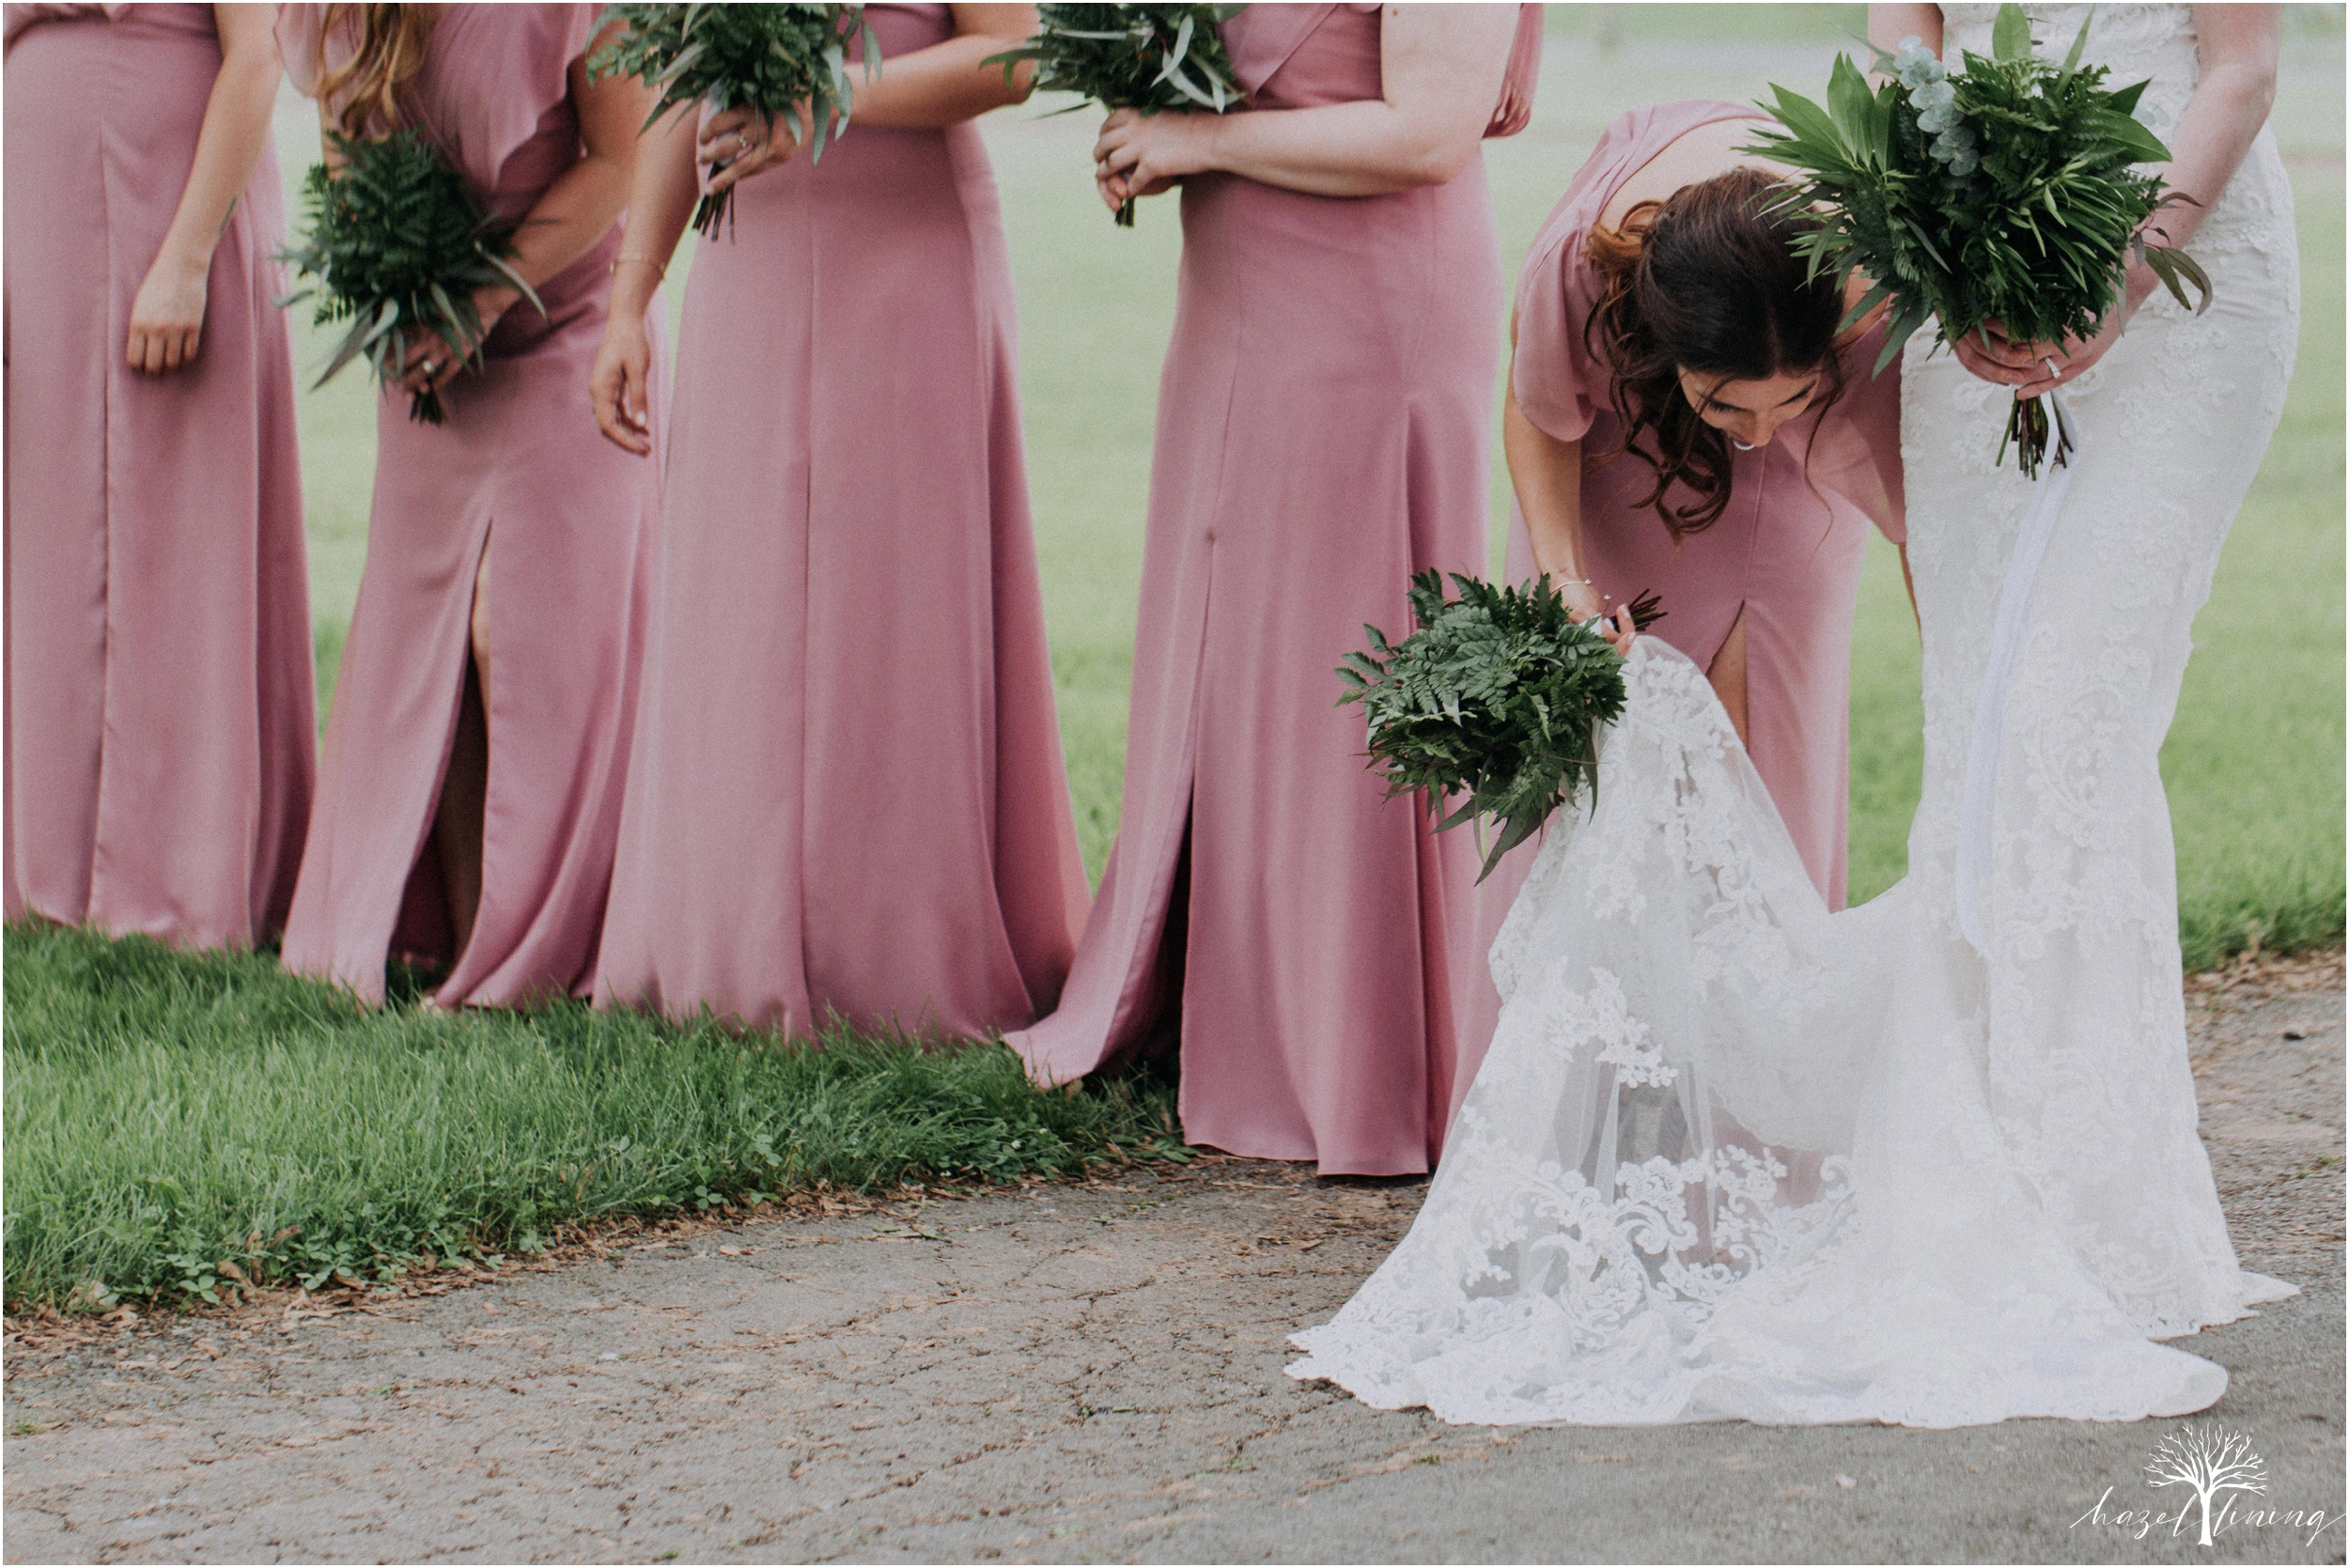 hazel-lining-travel-wedding-elopement-photography-lisa-landon-shoemaker-the-farm-bakery-and-events-bucks-county-quakertown-pennsylvania-summer-country-outdoor-farm-wedding_0069.jpg